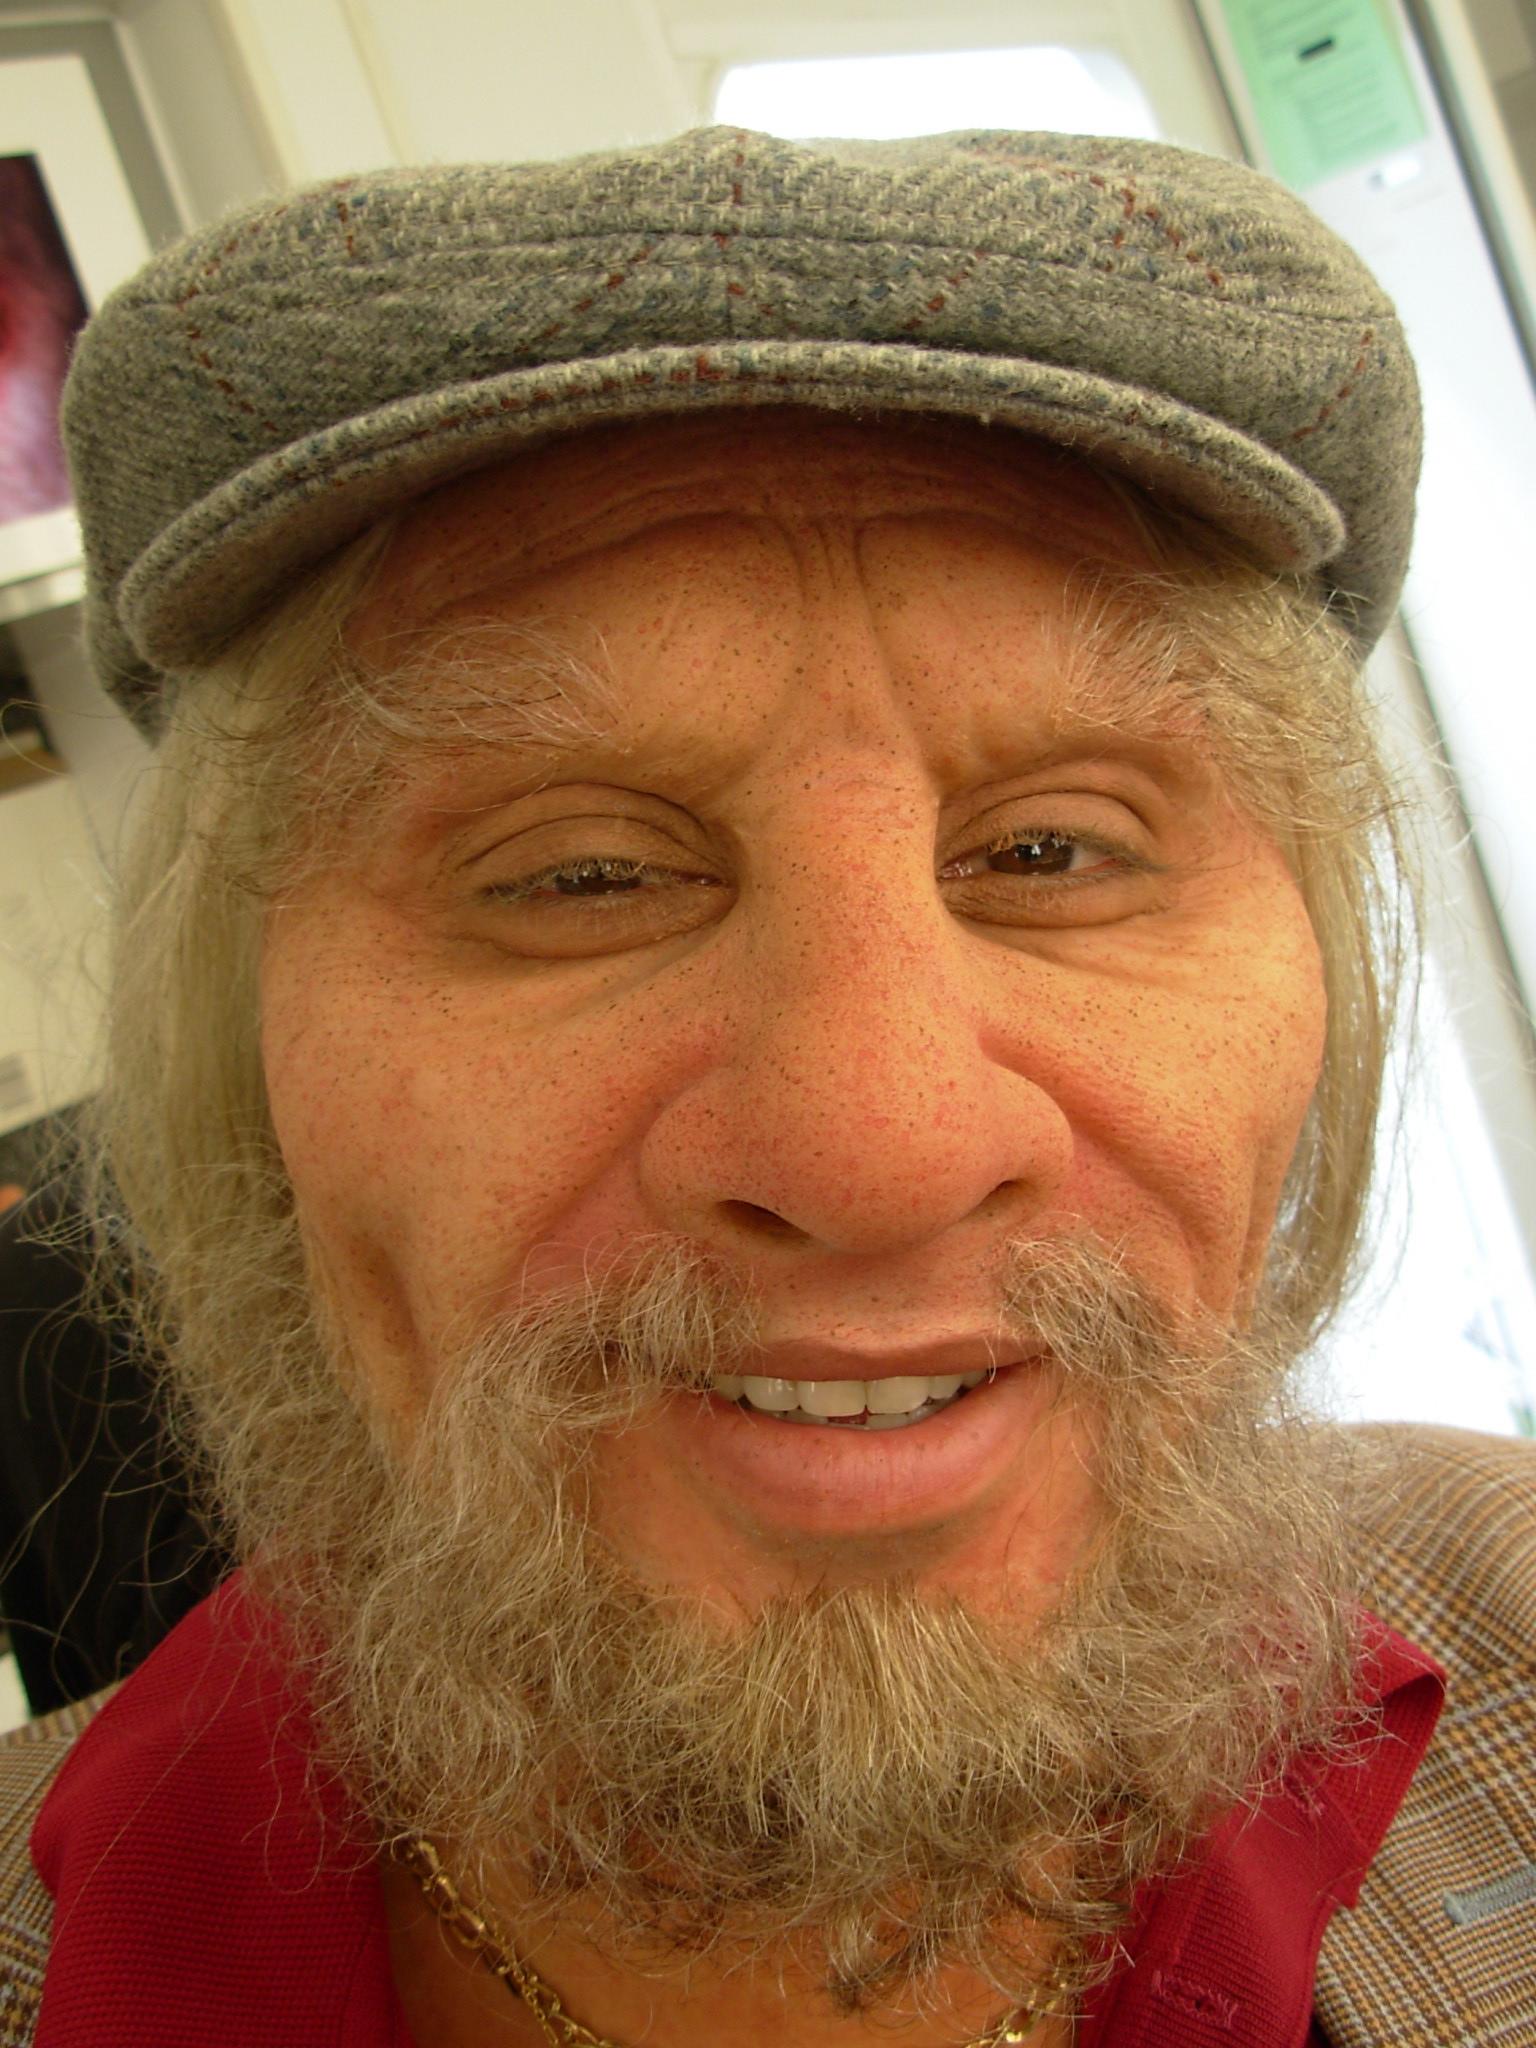 Caveman Ben After